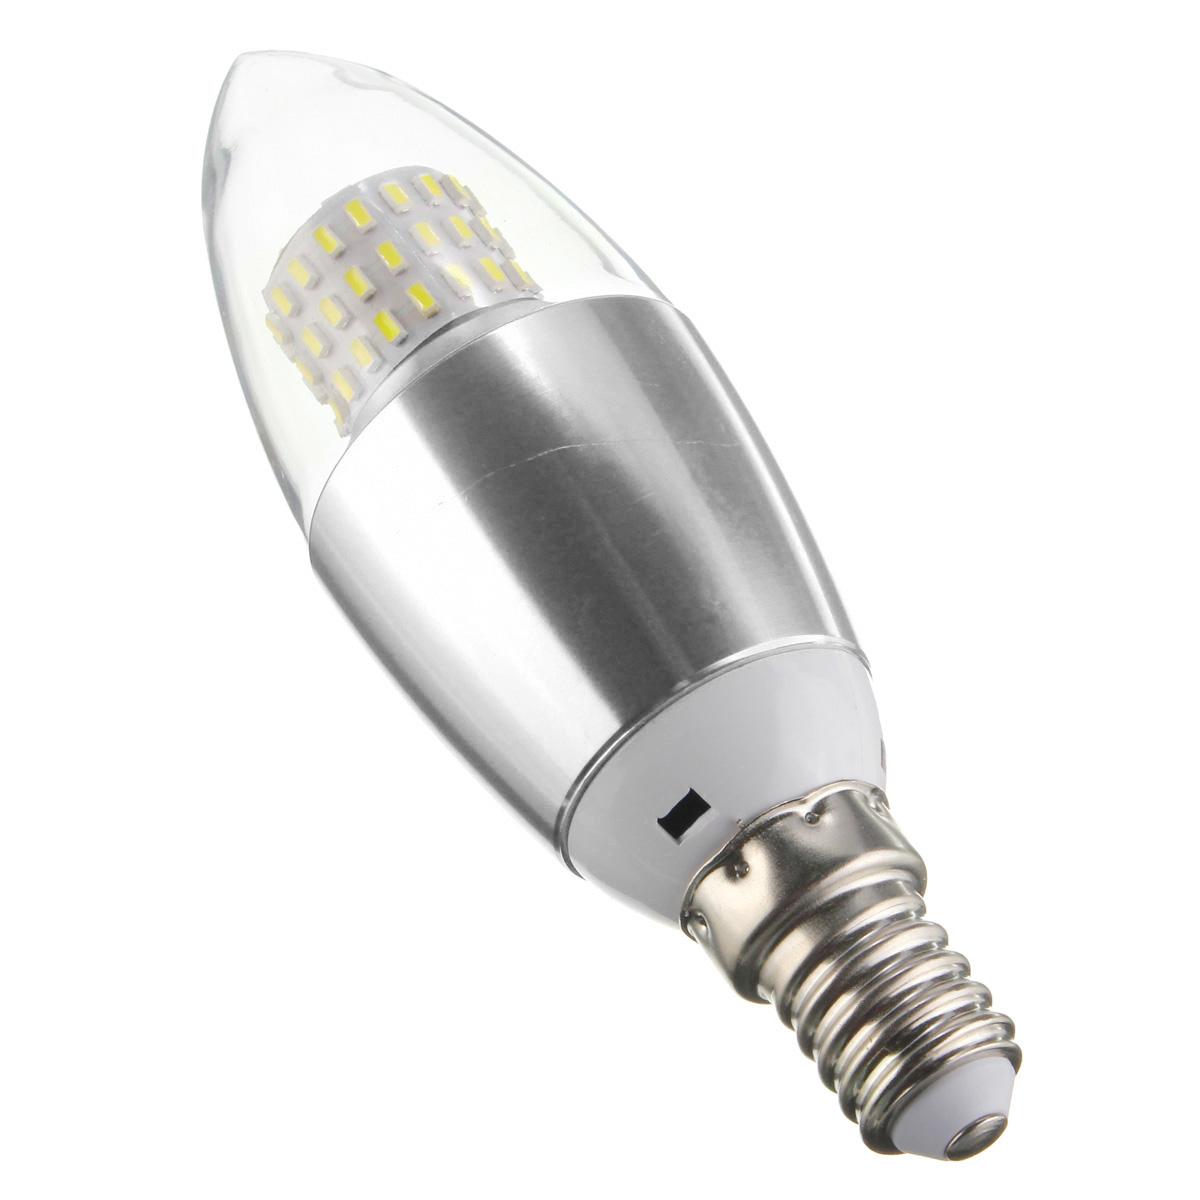 dimmable e27 e12 e14 7w 60 smd 3014 led warm white white sliver candle lamp bulb ac 220v. Black Bedroom Furniture Sets. Home Design Ideas